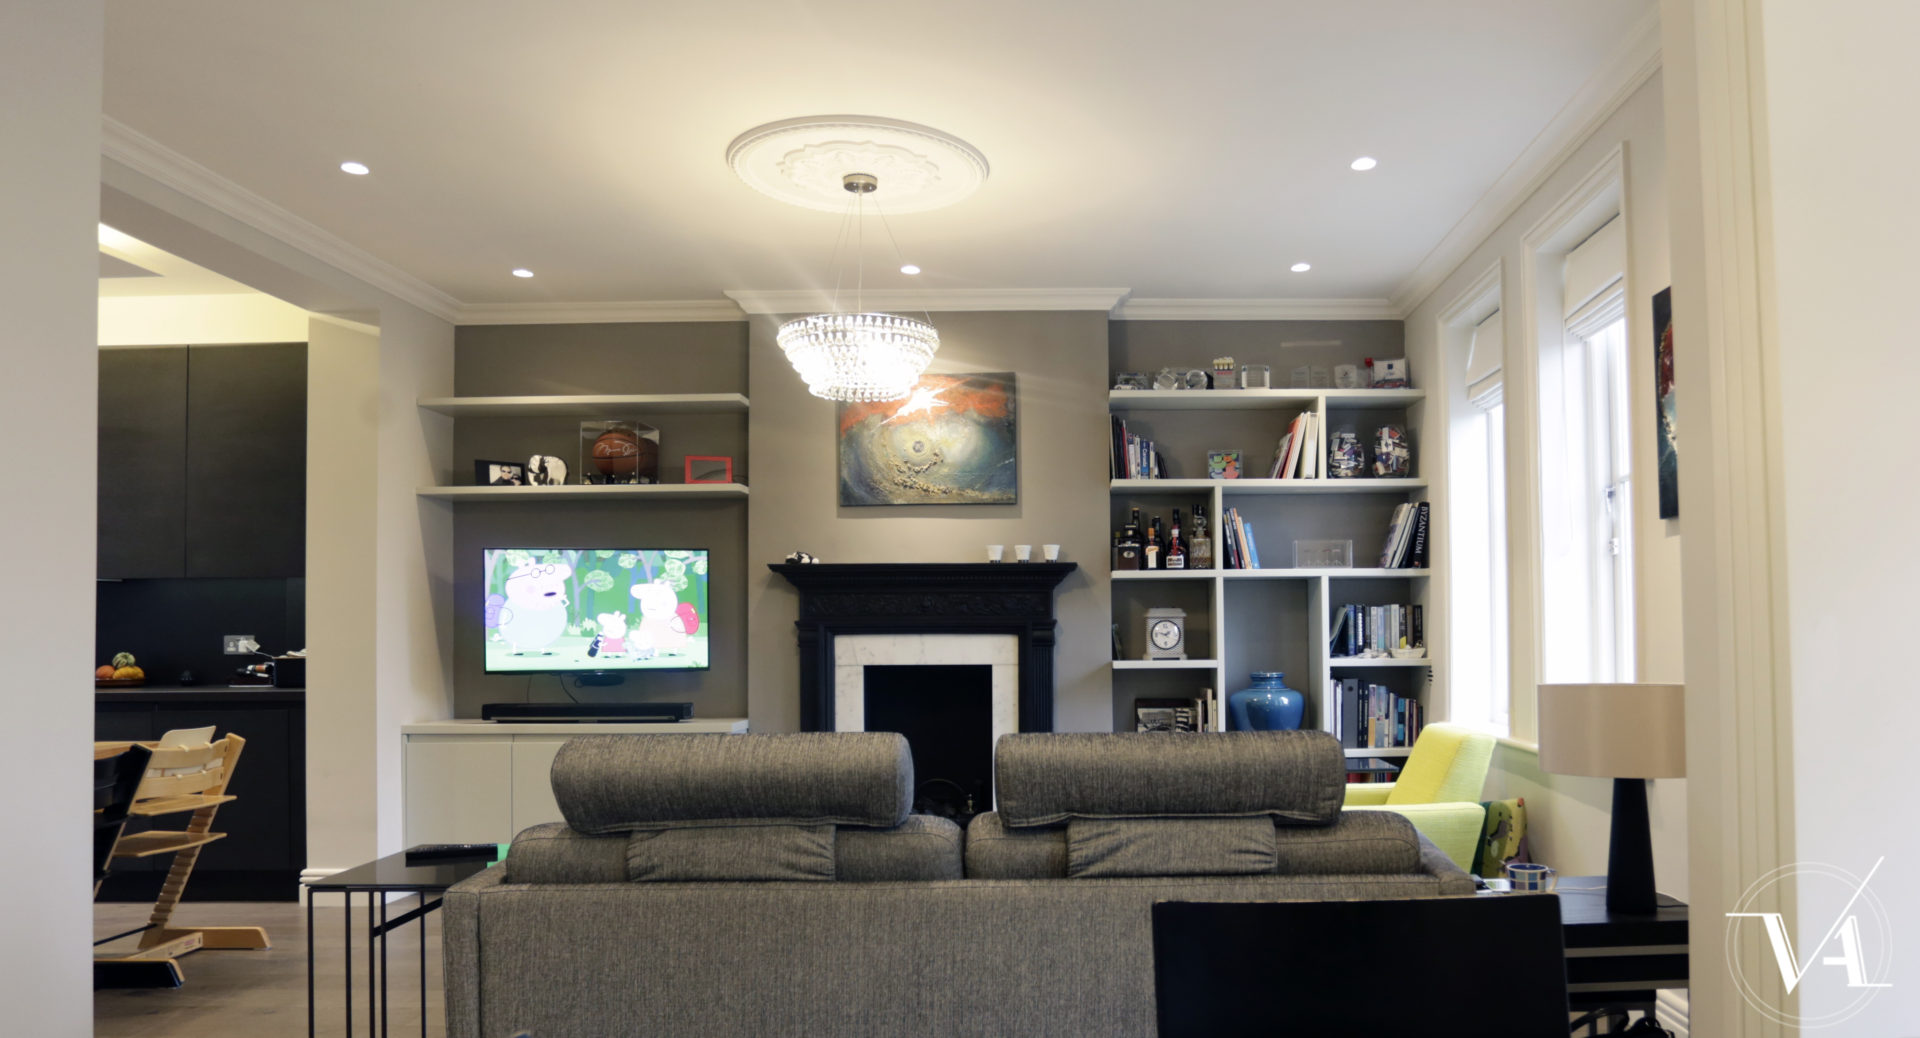 High End Interior Design Part - 43: Carlton Mansions U2013 High End Refursbishment In Maida Vale, London · Interiors